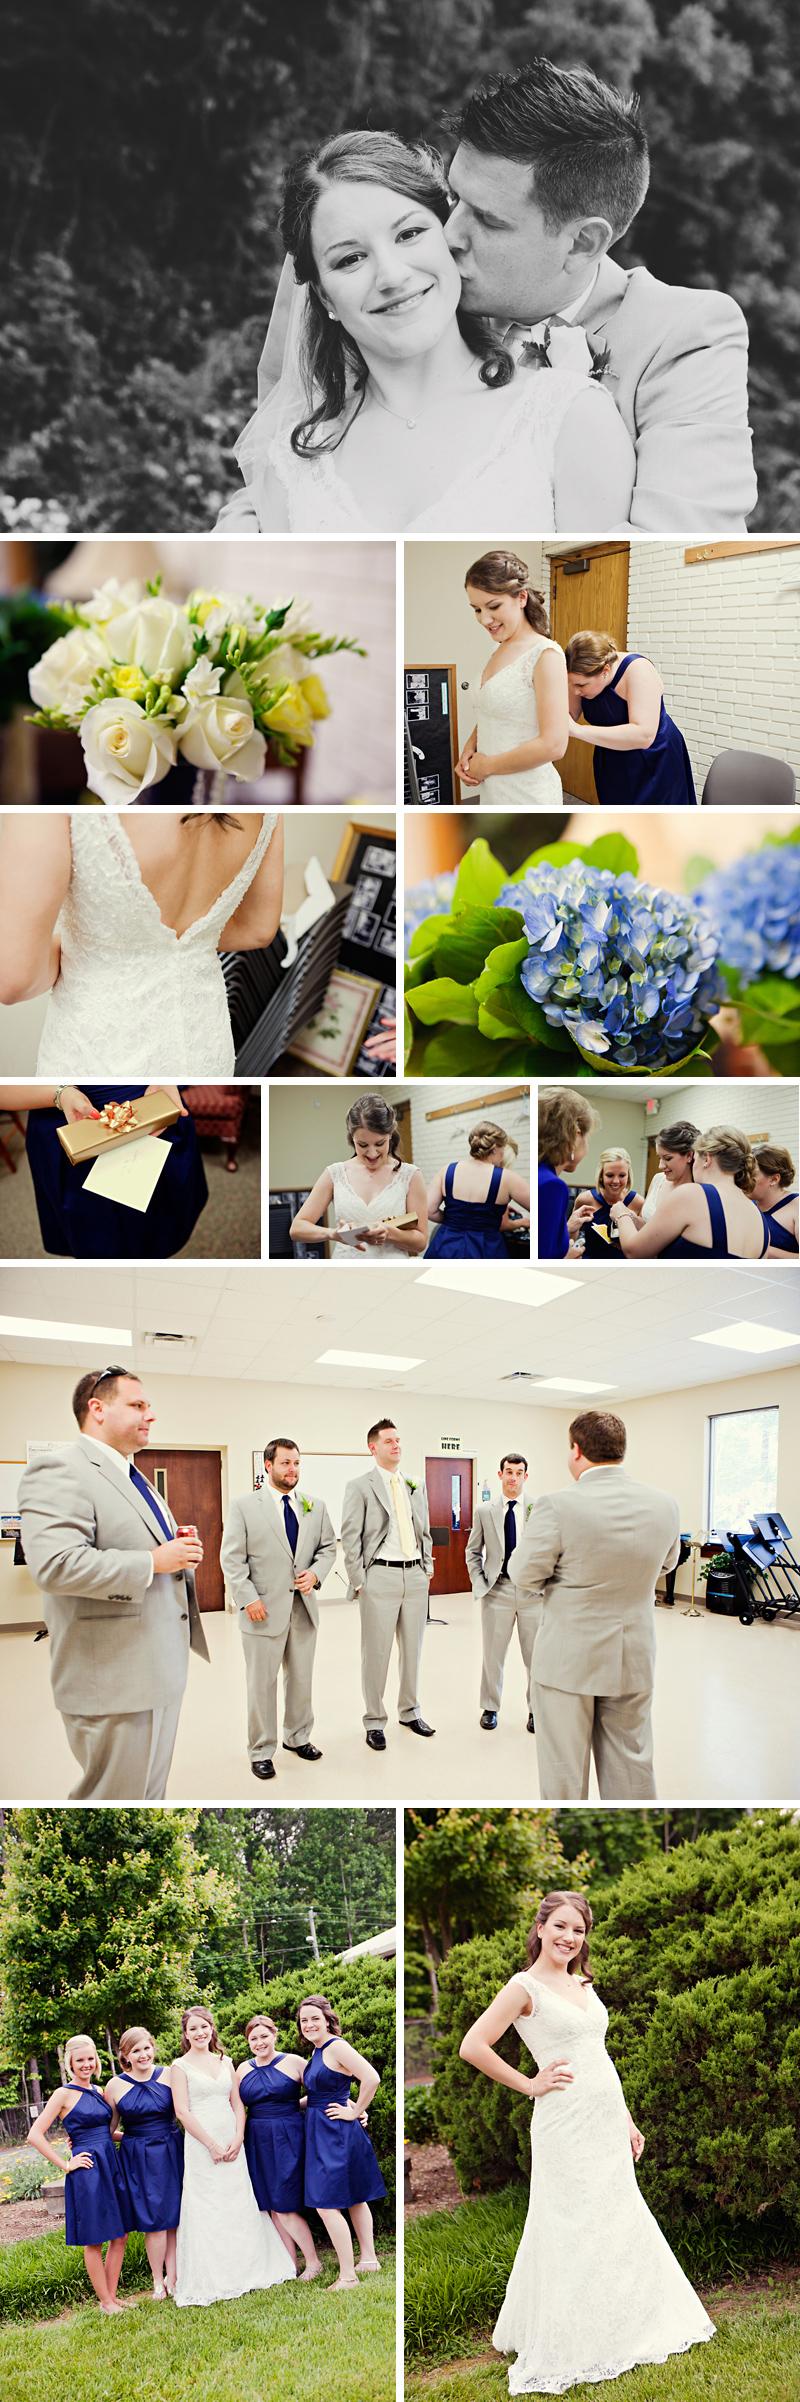 Raleigh-Wedding-Photographerc004